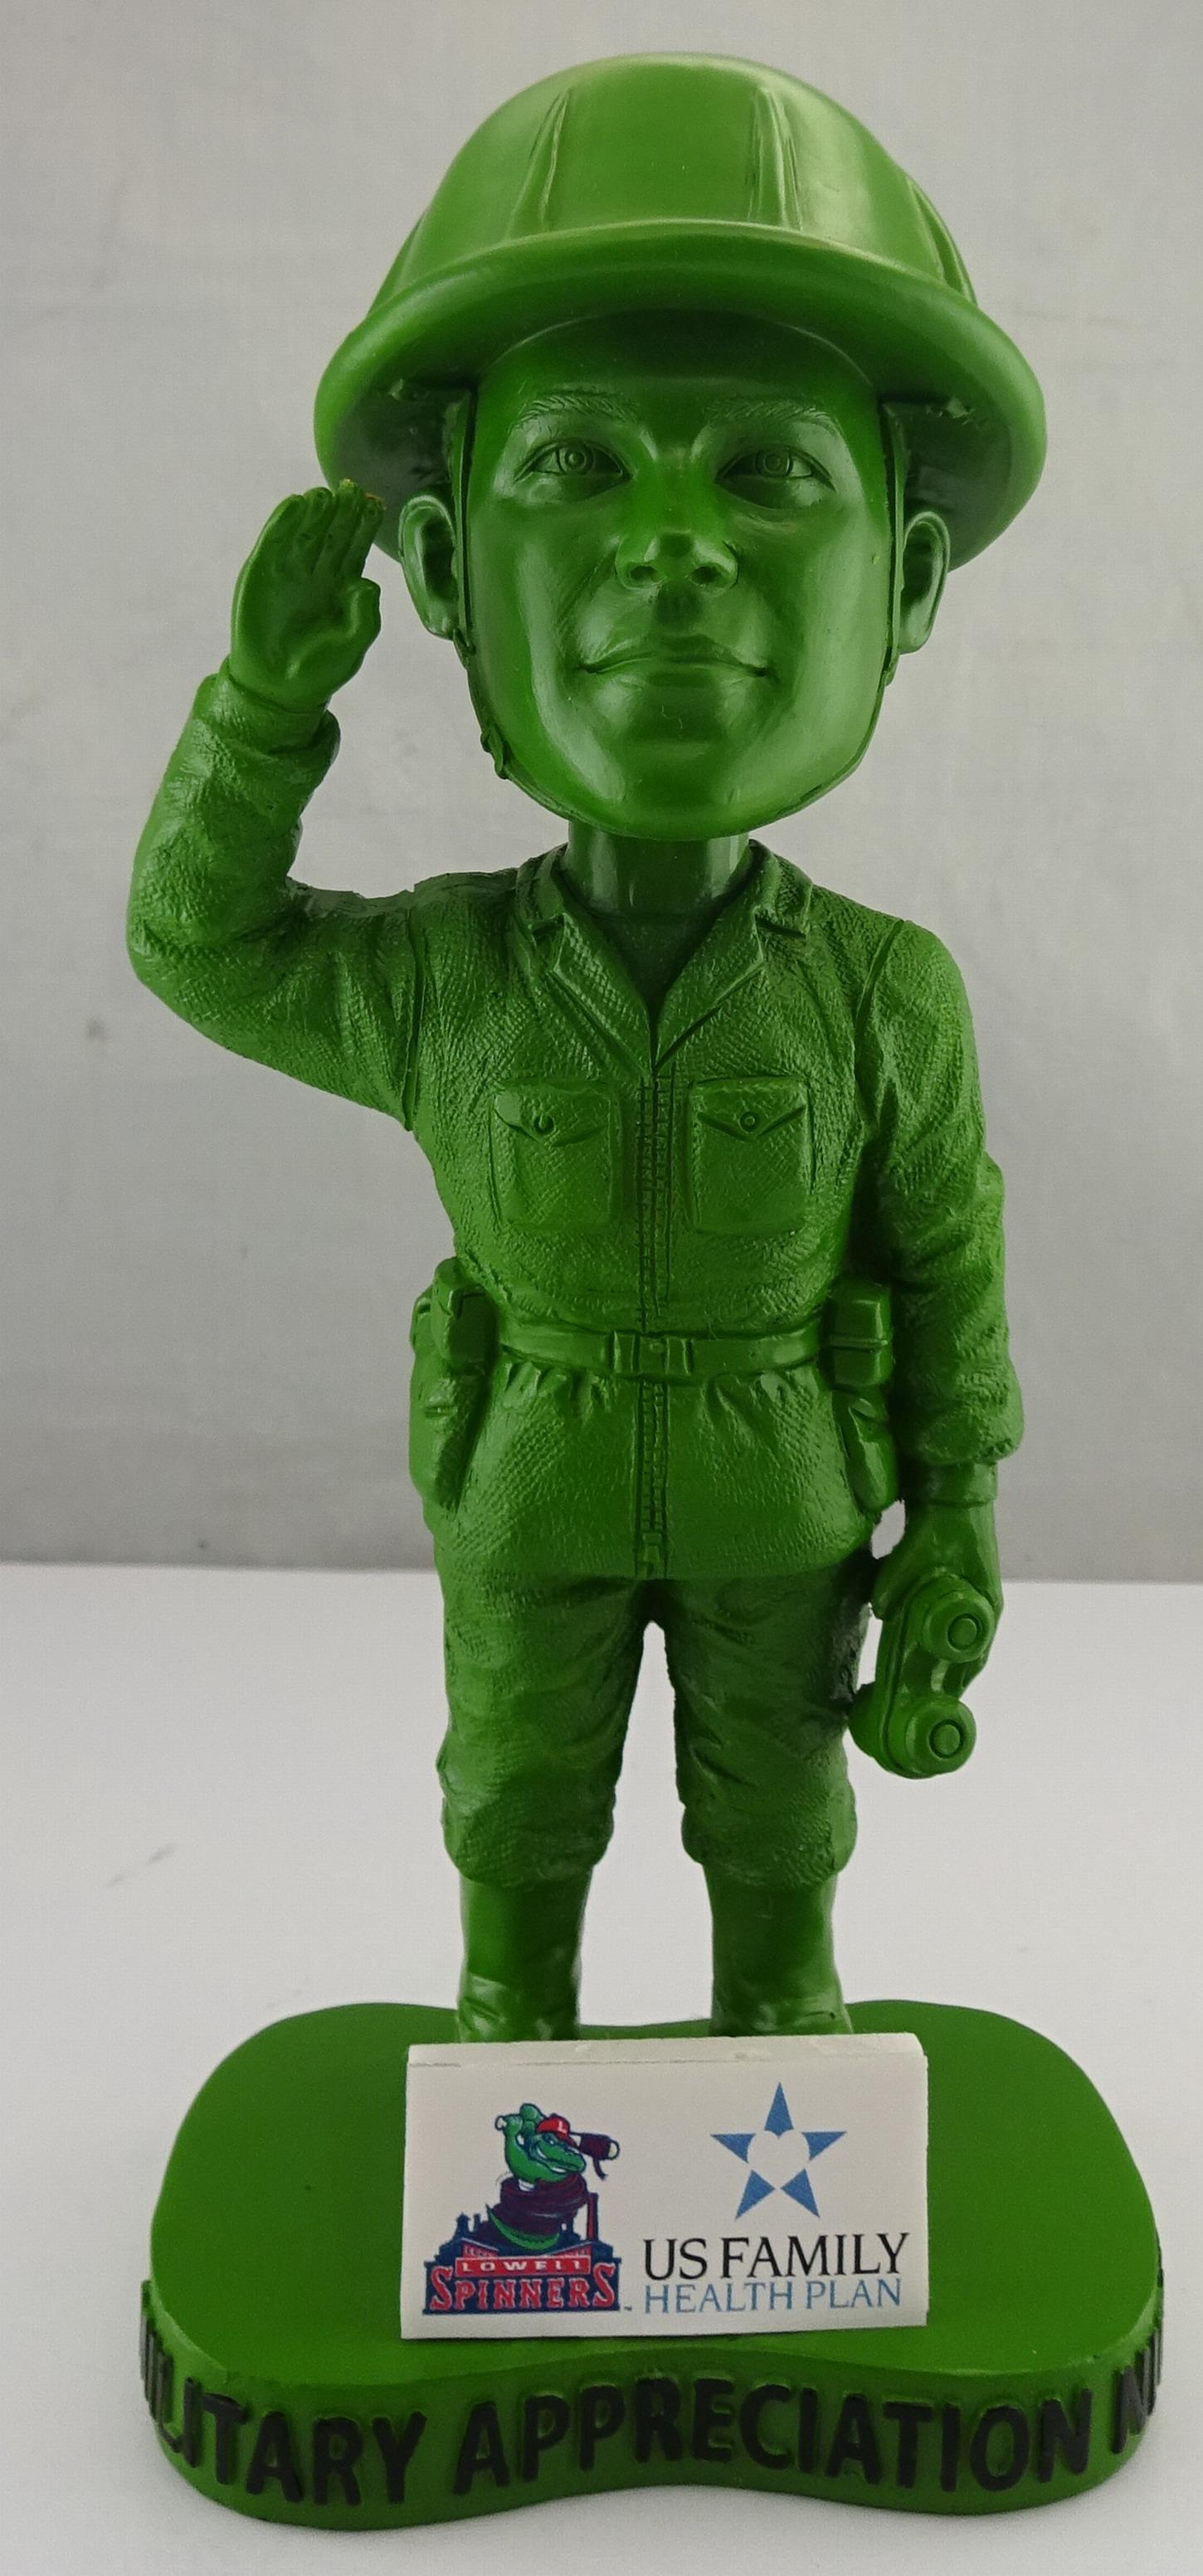 Lowell Spinners - Little Green Army Man 113560, 7in Bobblehead (2).jpg